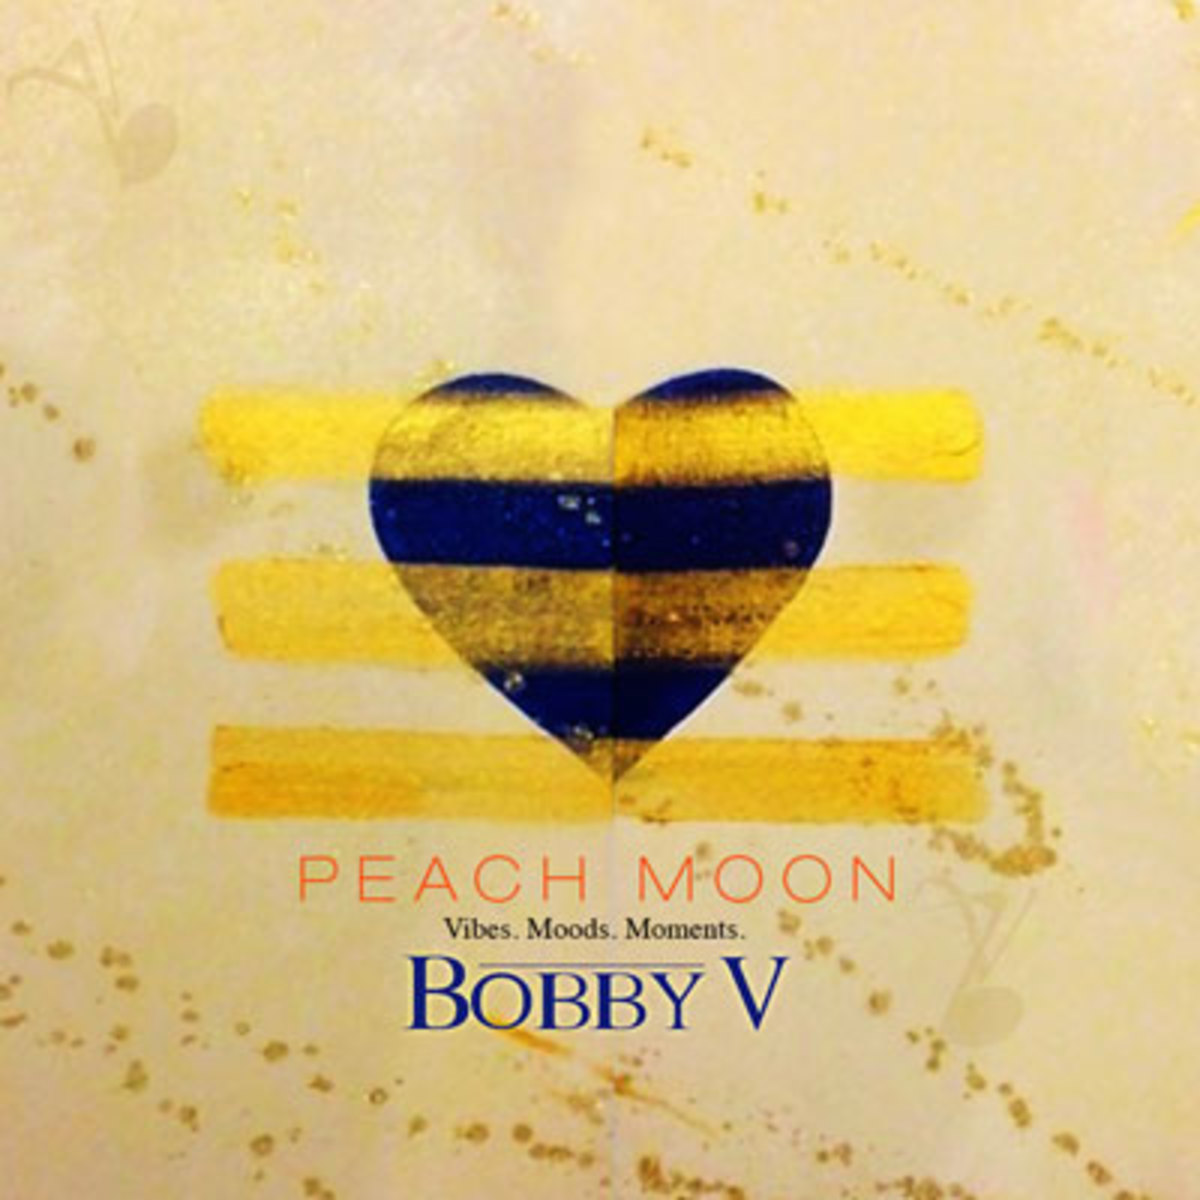 bobbyv-peachmoonep.jpg